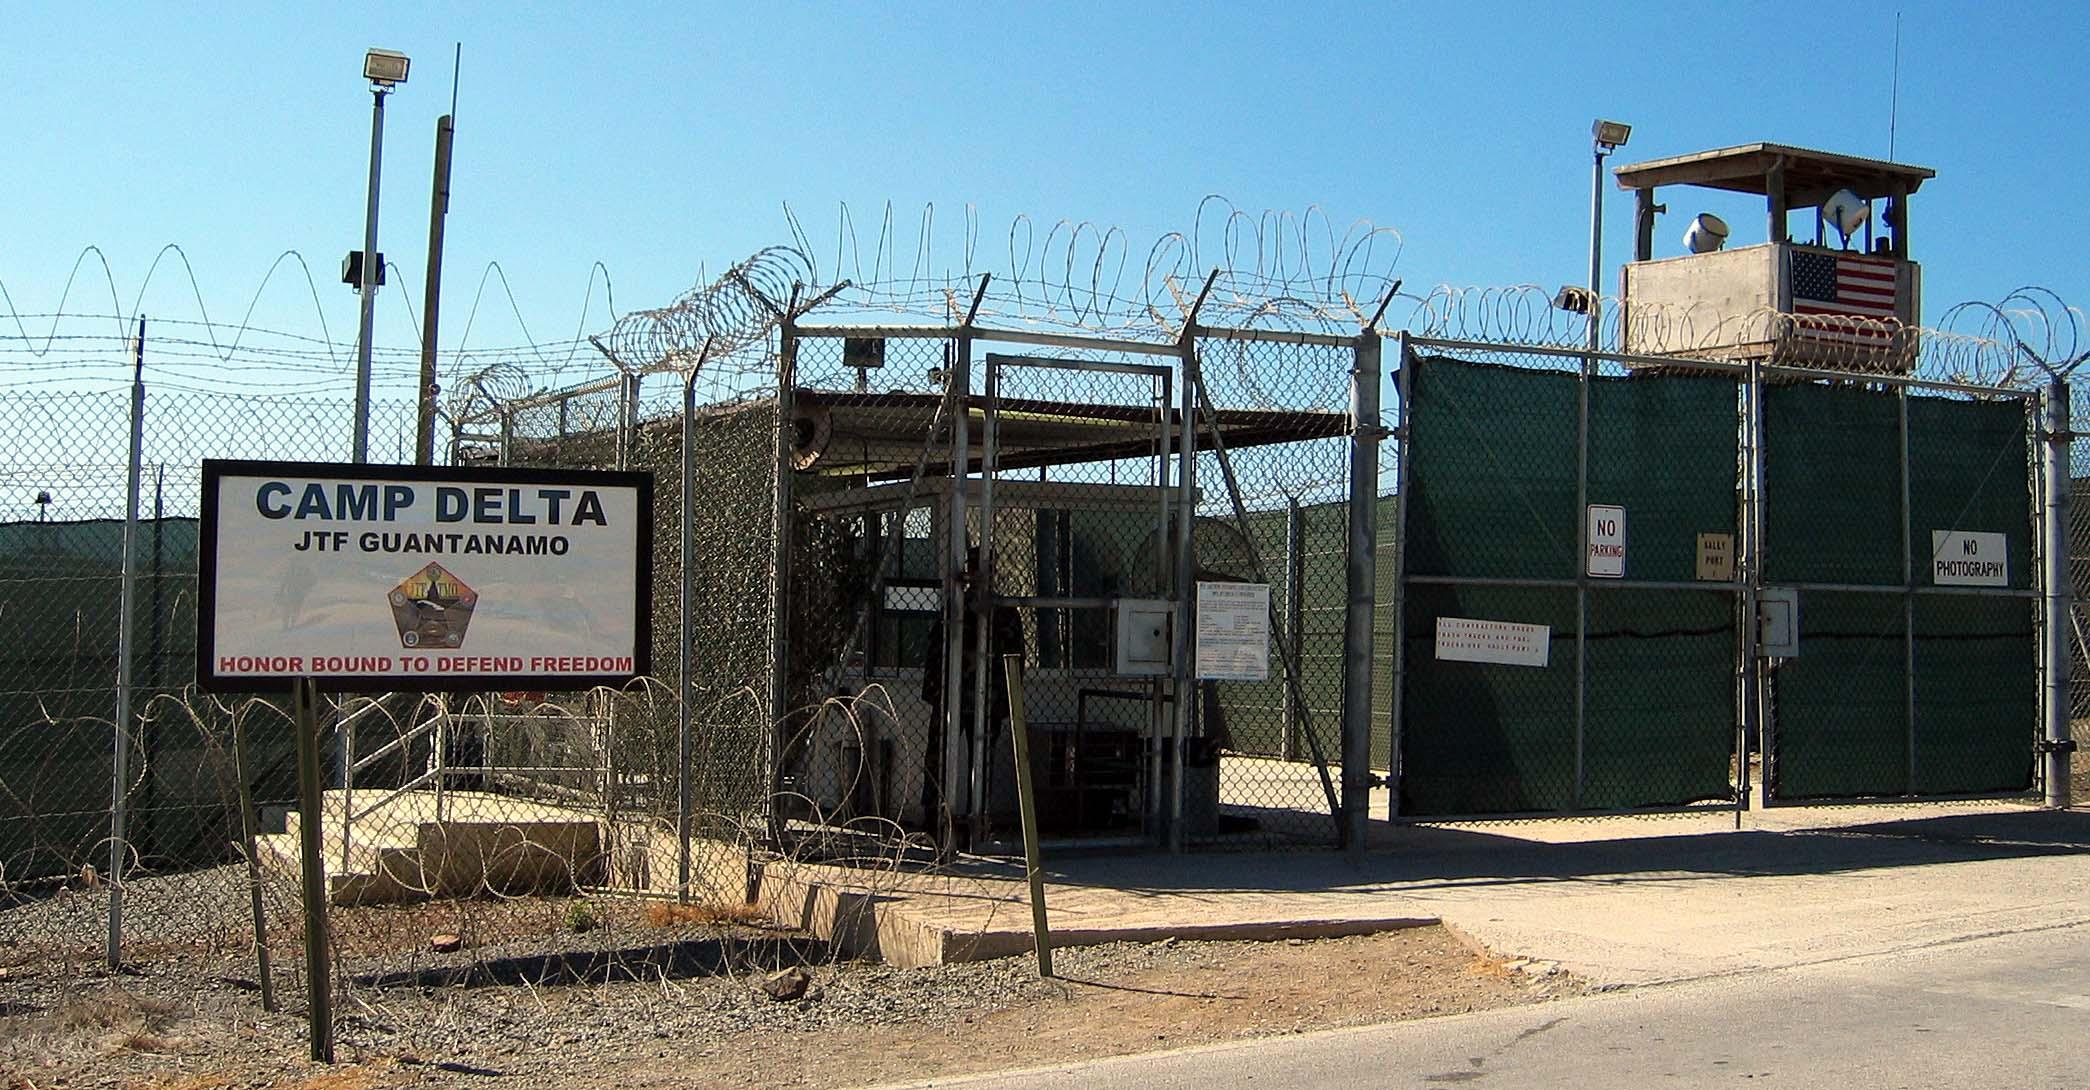 https://upload.wikimedia.org/wikipedia/commons/7/74/Camp_Delta,_Guantanamo_Bay,_Cuba.jpg